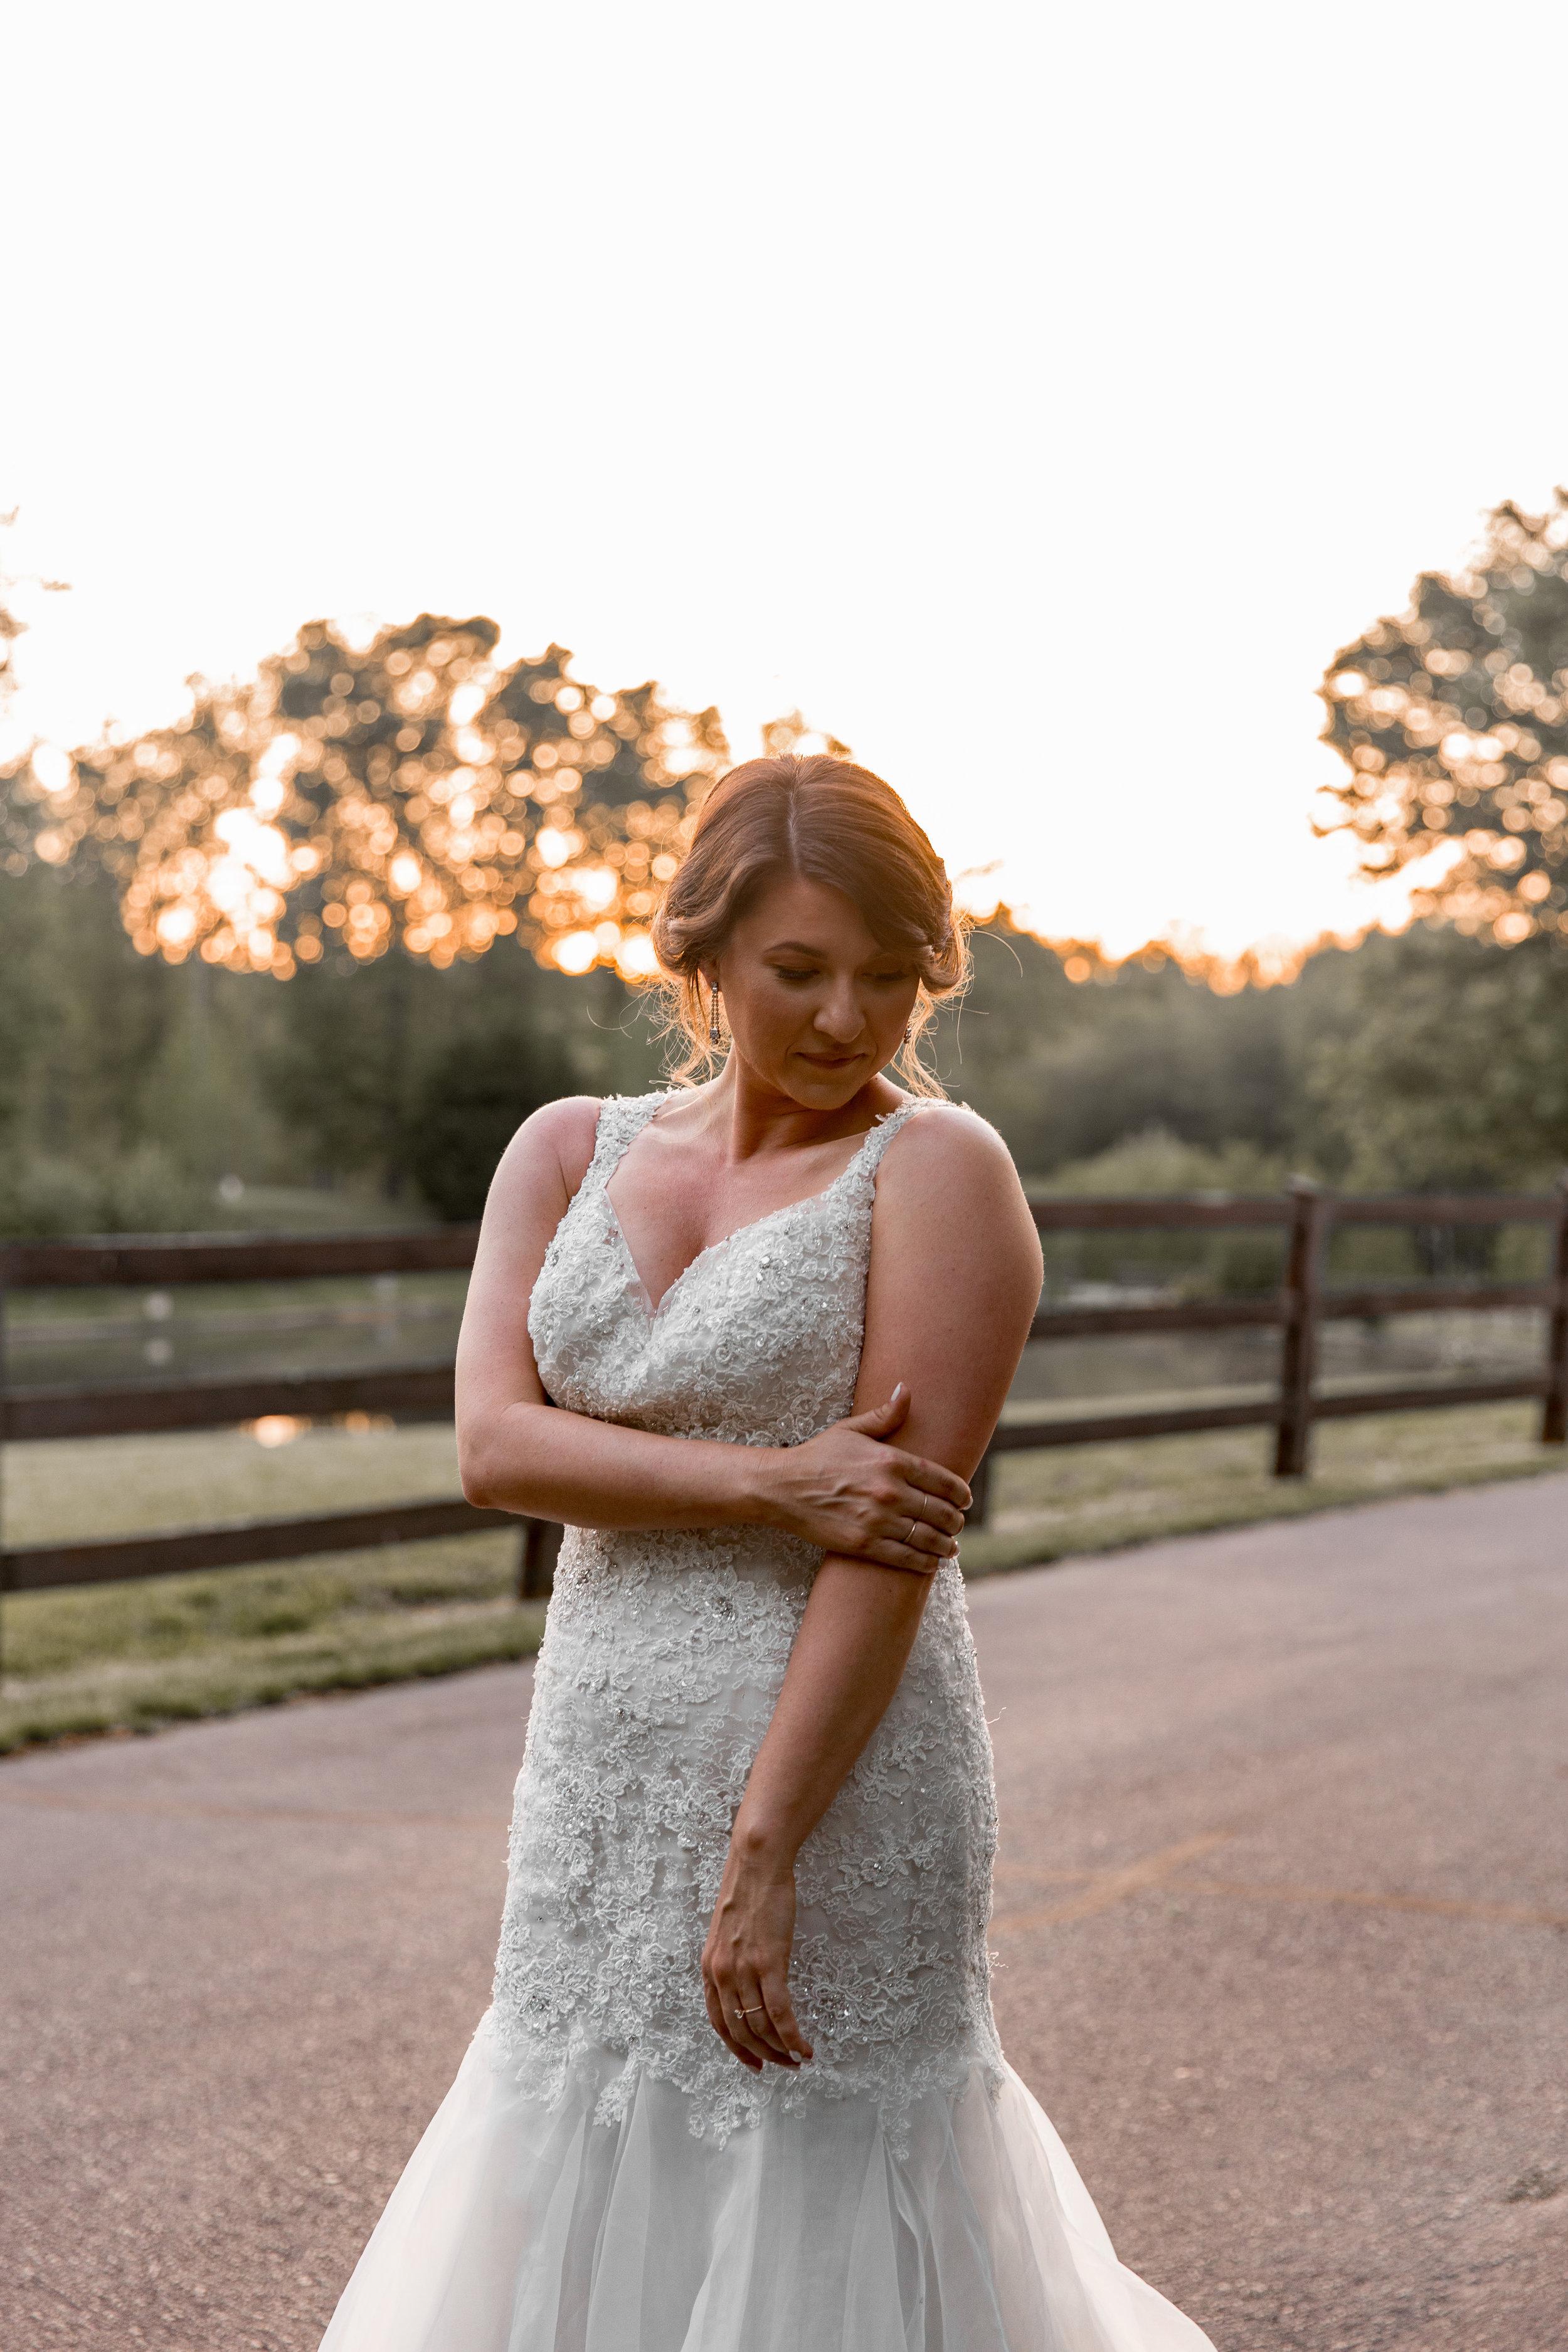 MelanieJoyBridal-6249.jpg